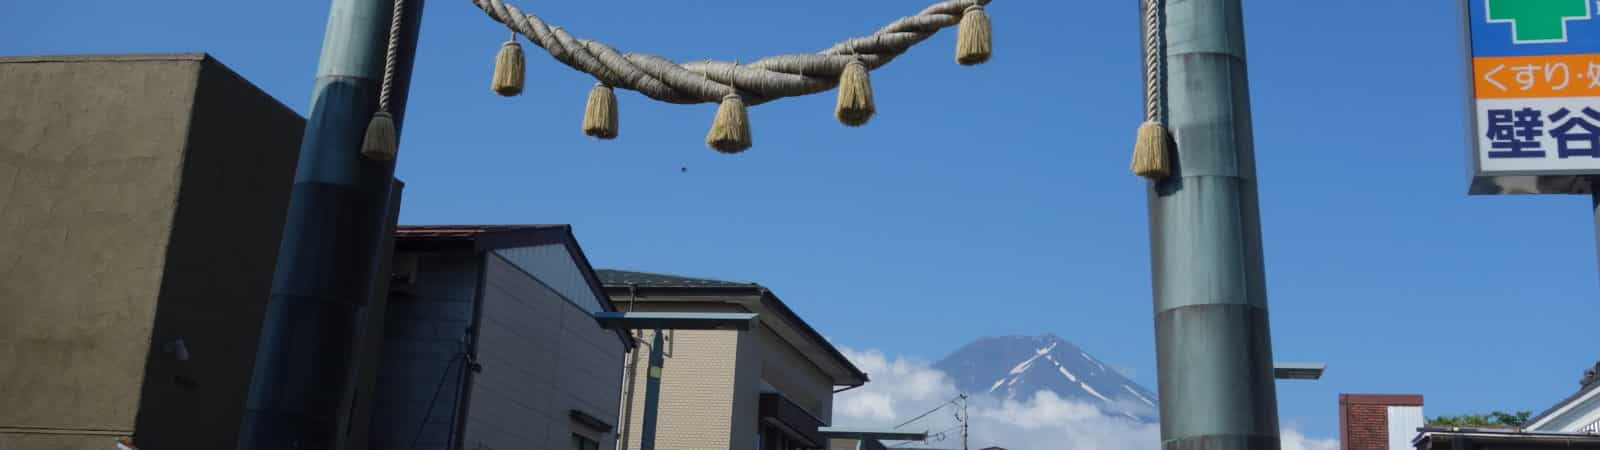 Climbing Mount Fuji with a guide